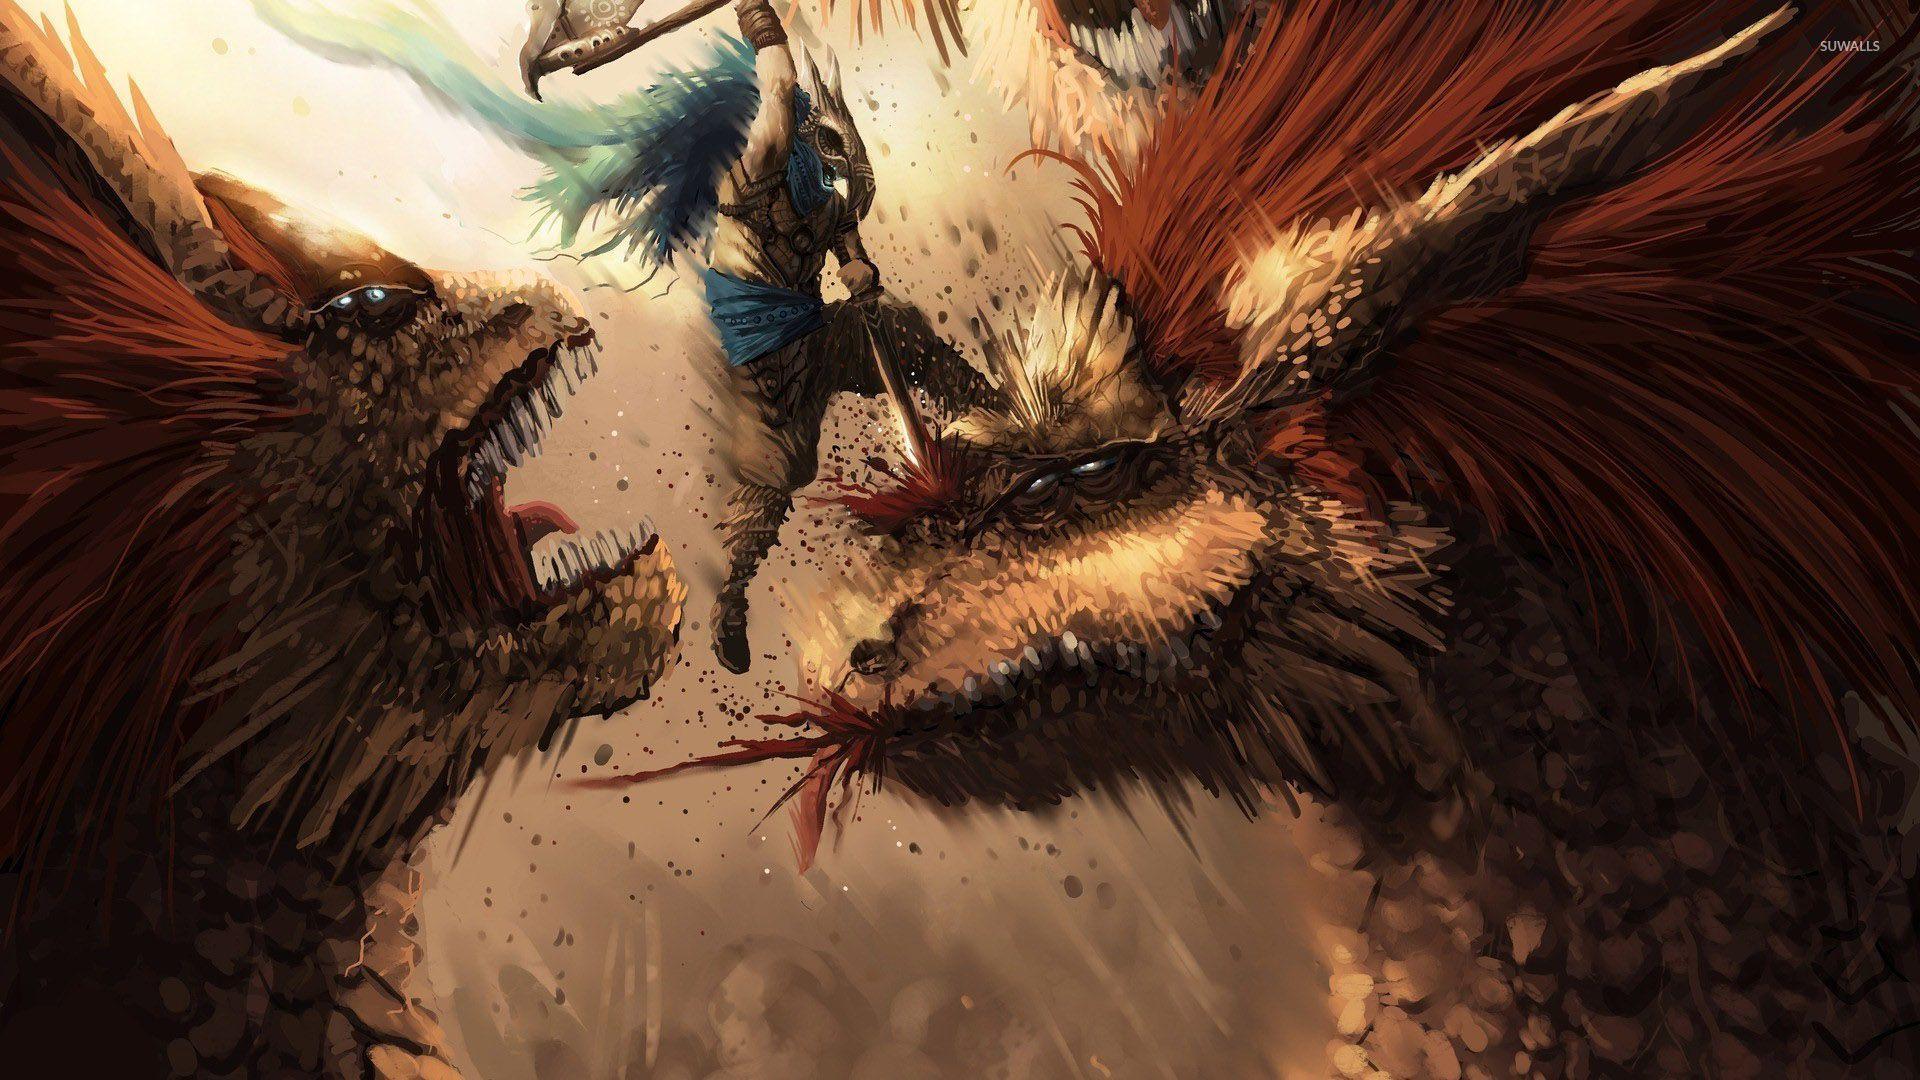 Free Download Monster Hunter Wallpaper 1920x1080 1920x1080 For